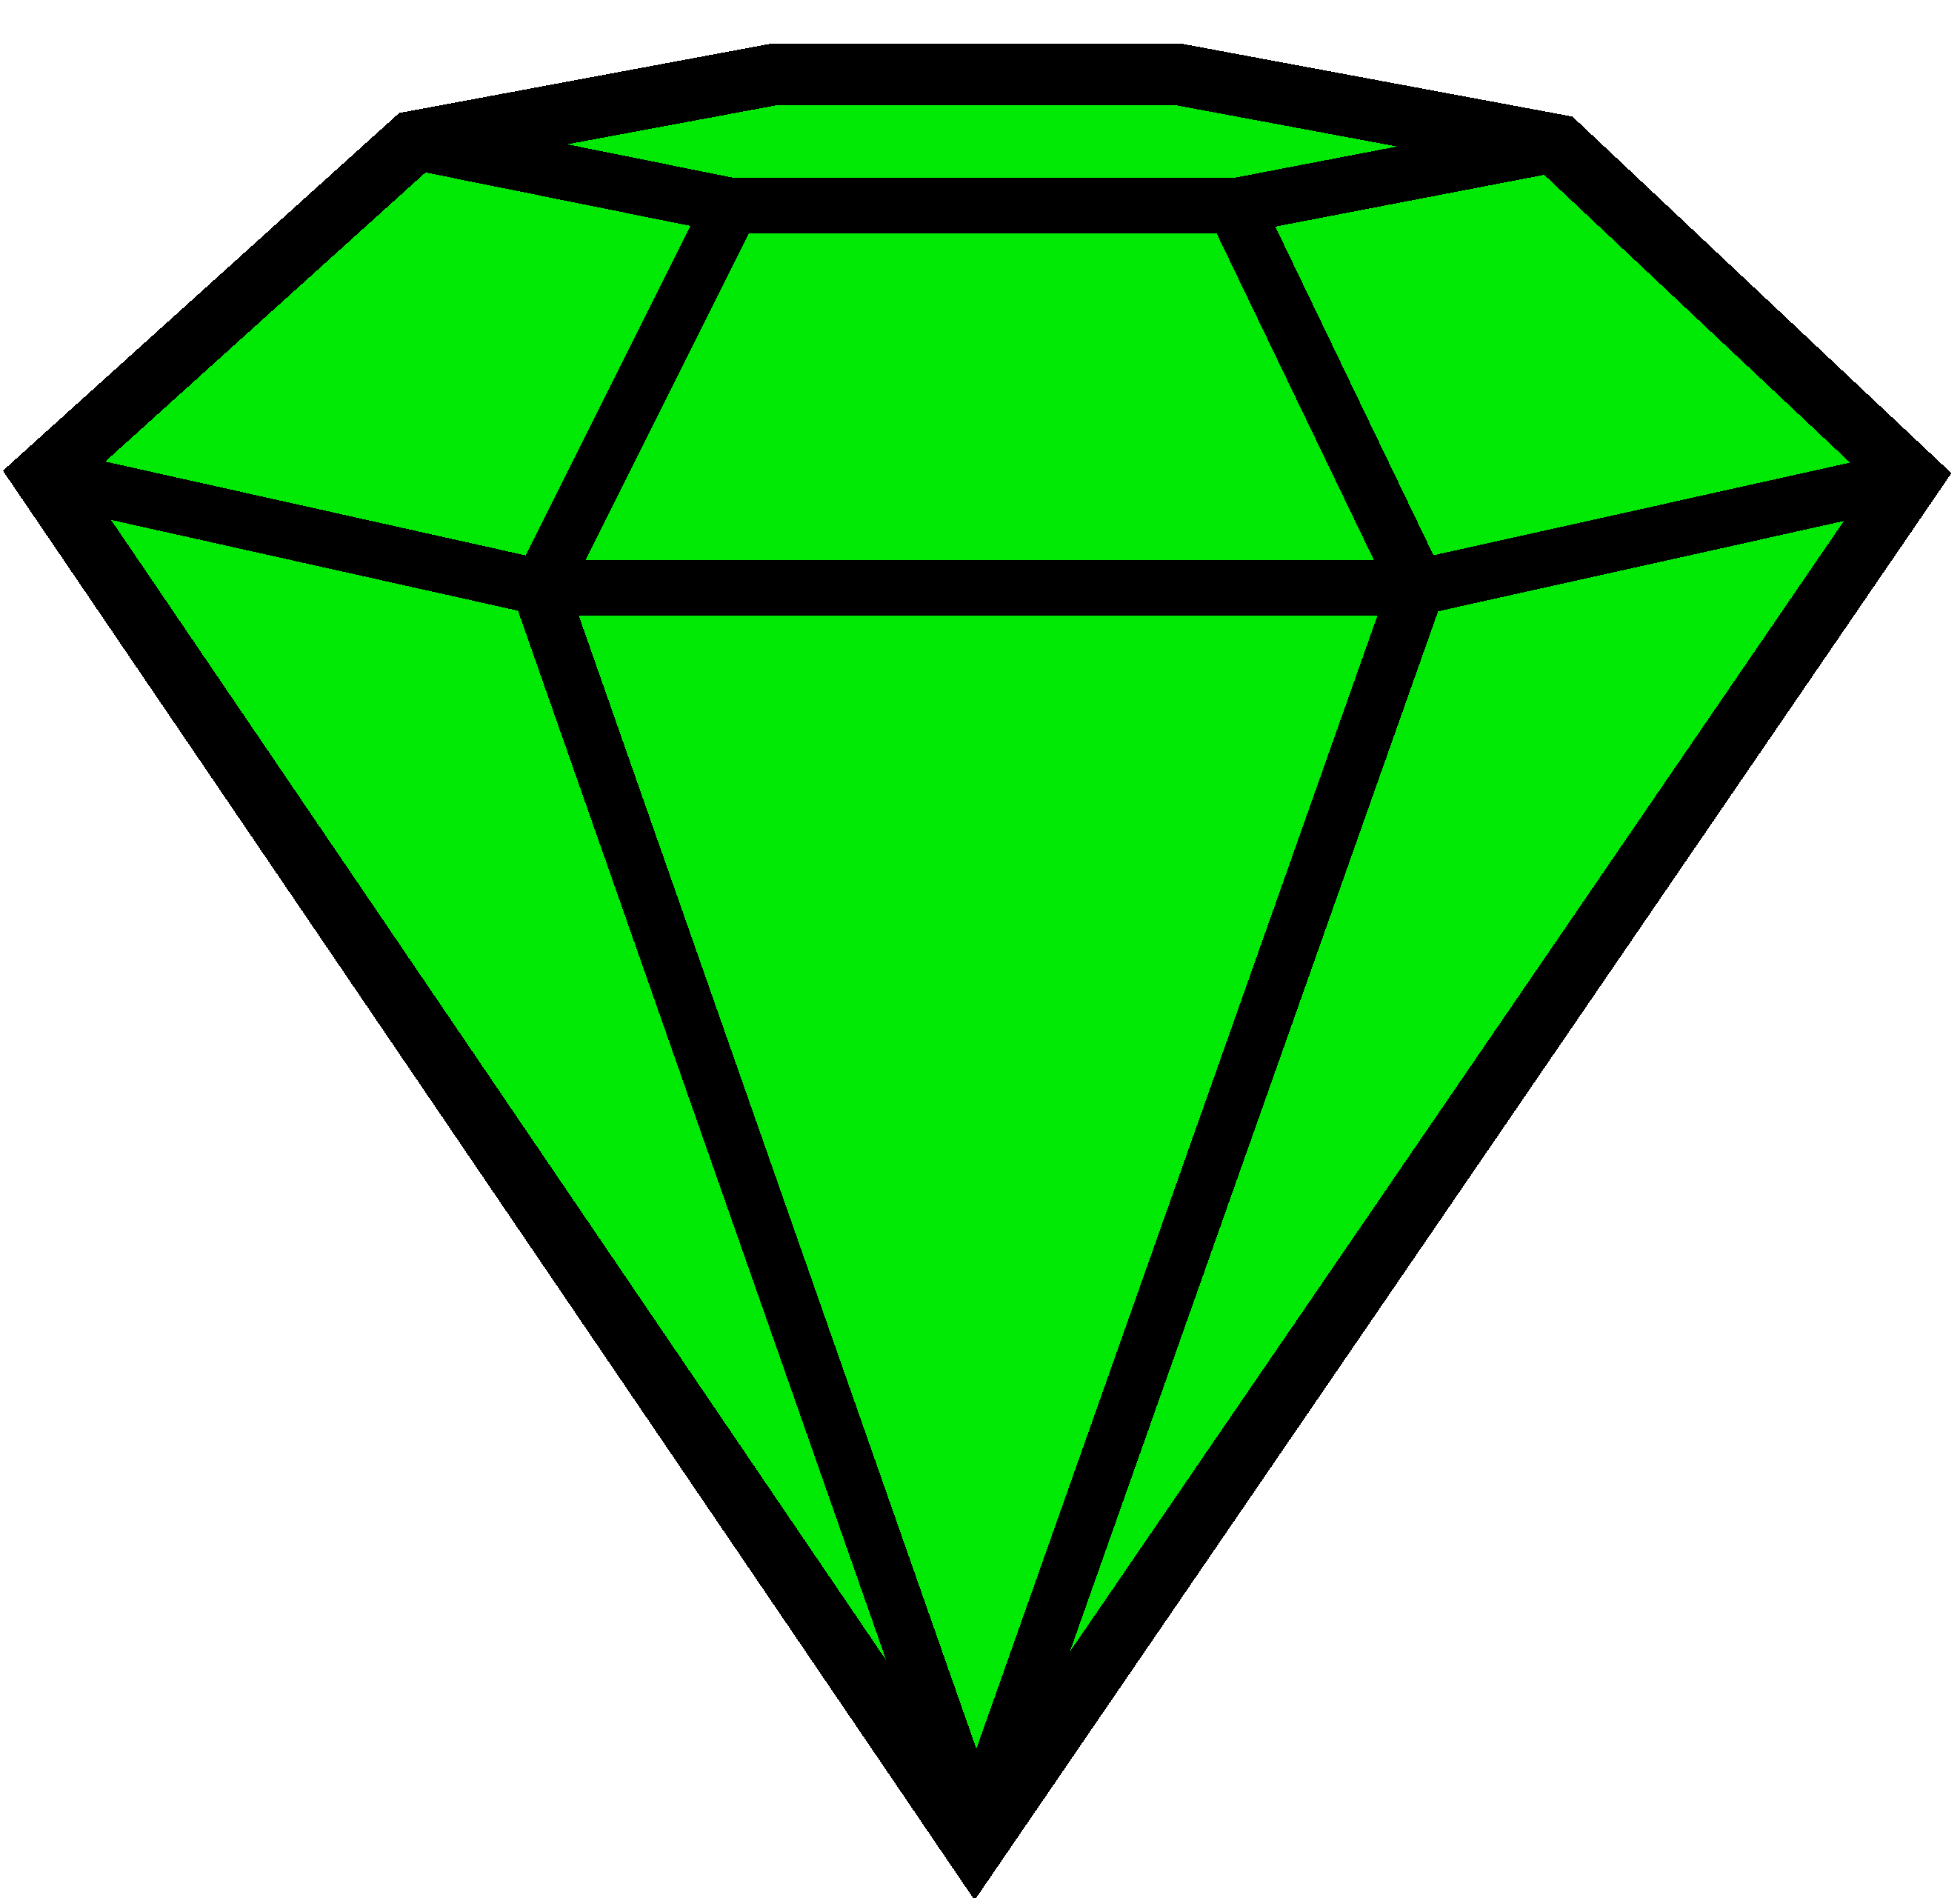 Emerald clipart #13